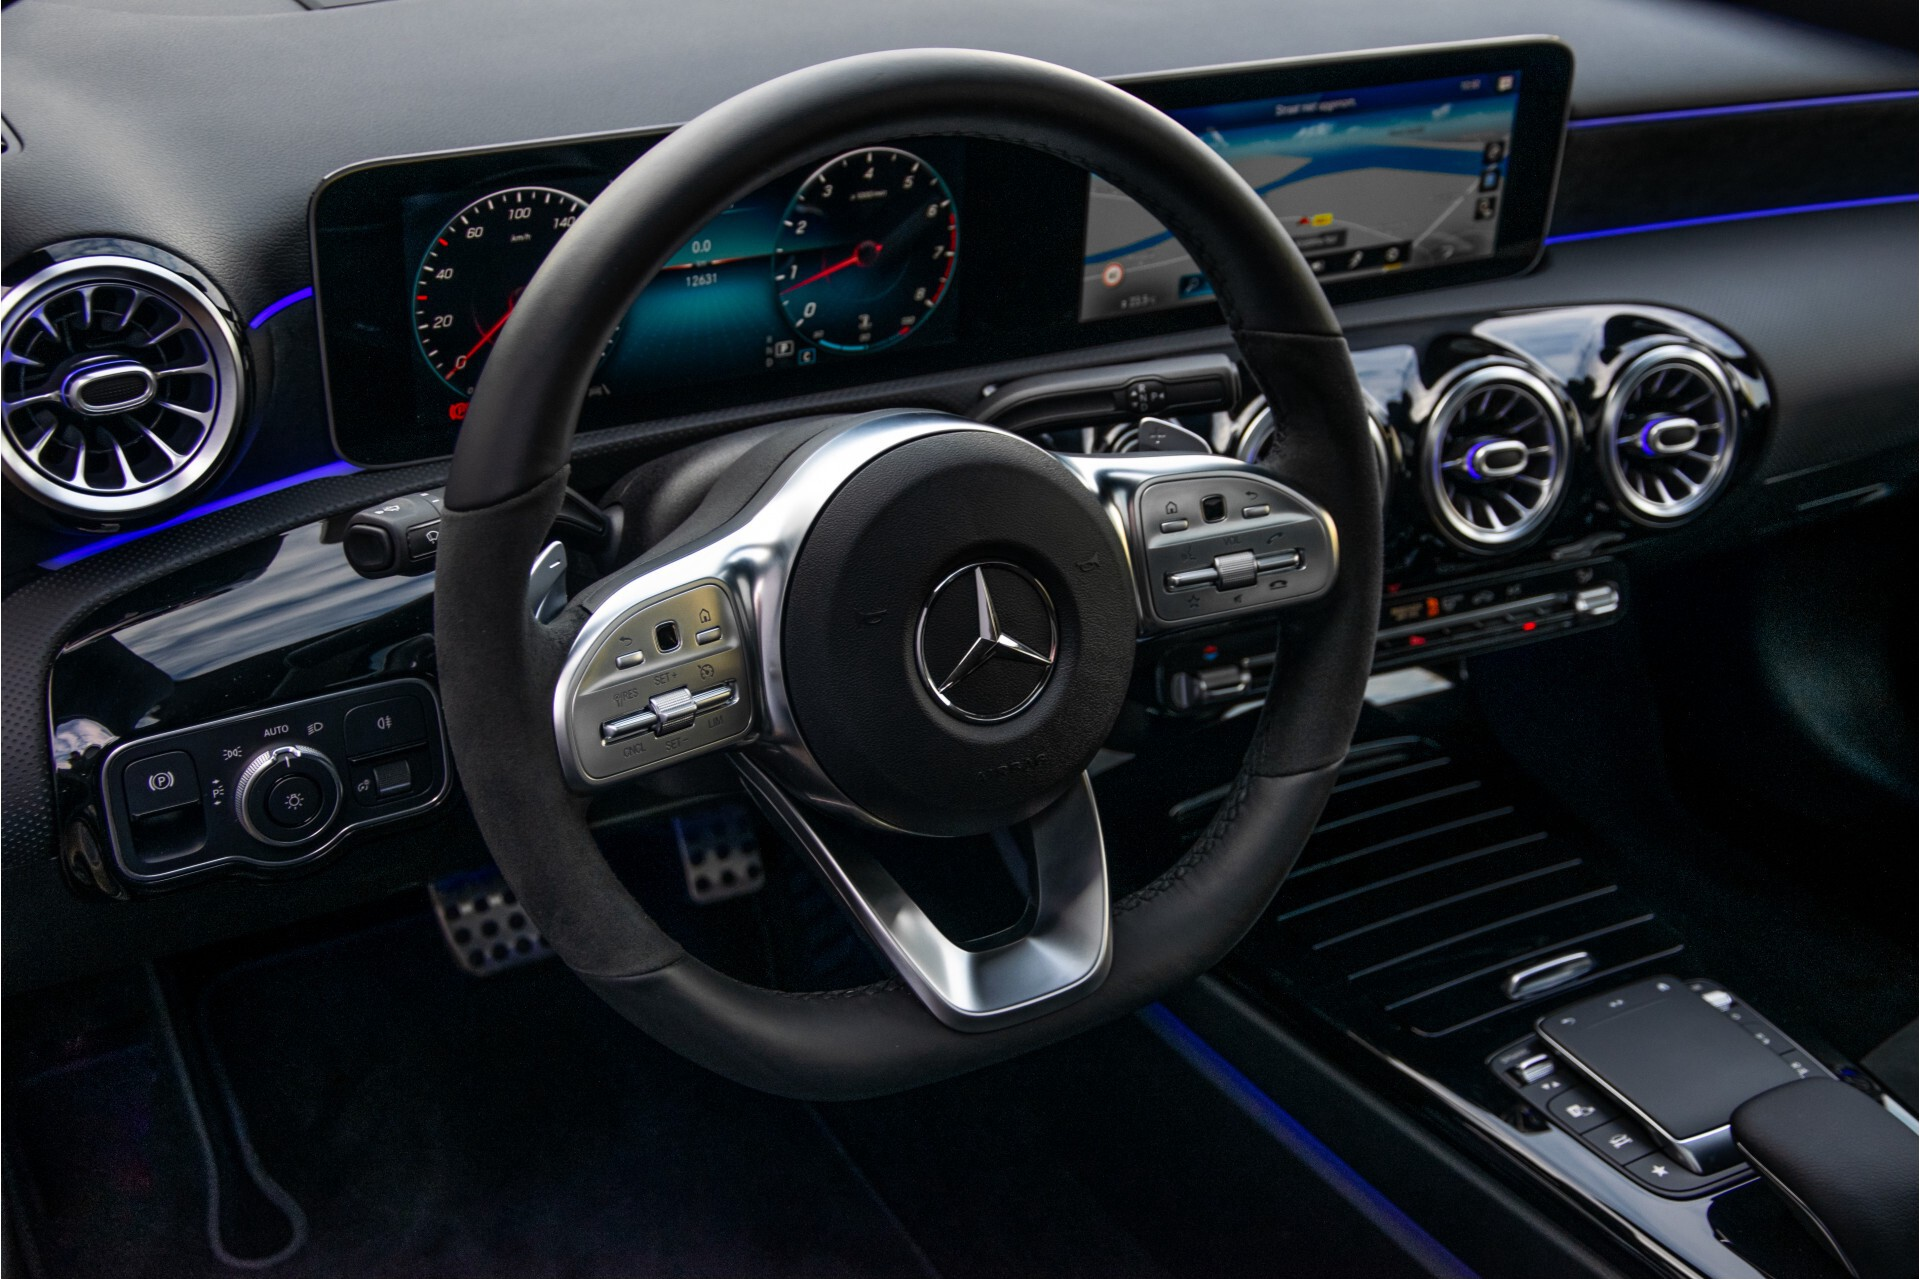 Mercedes-Benz A-Klasse 250 4-M AMG Panorama/Keyless-Entry/MBUX/HUD/Burmester/360/Multibeam LED Aut7 Foto 33